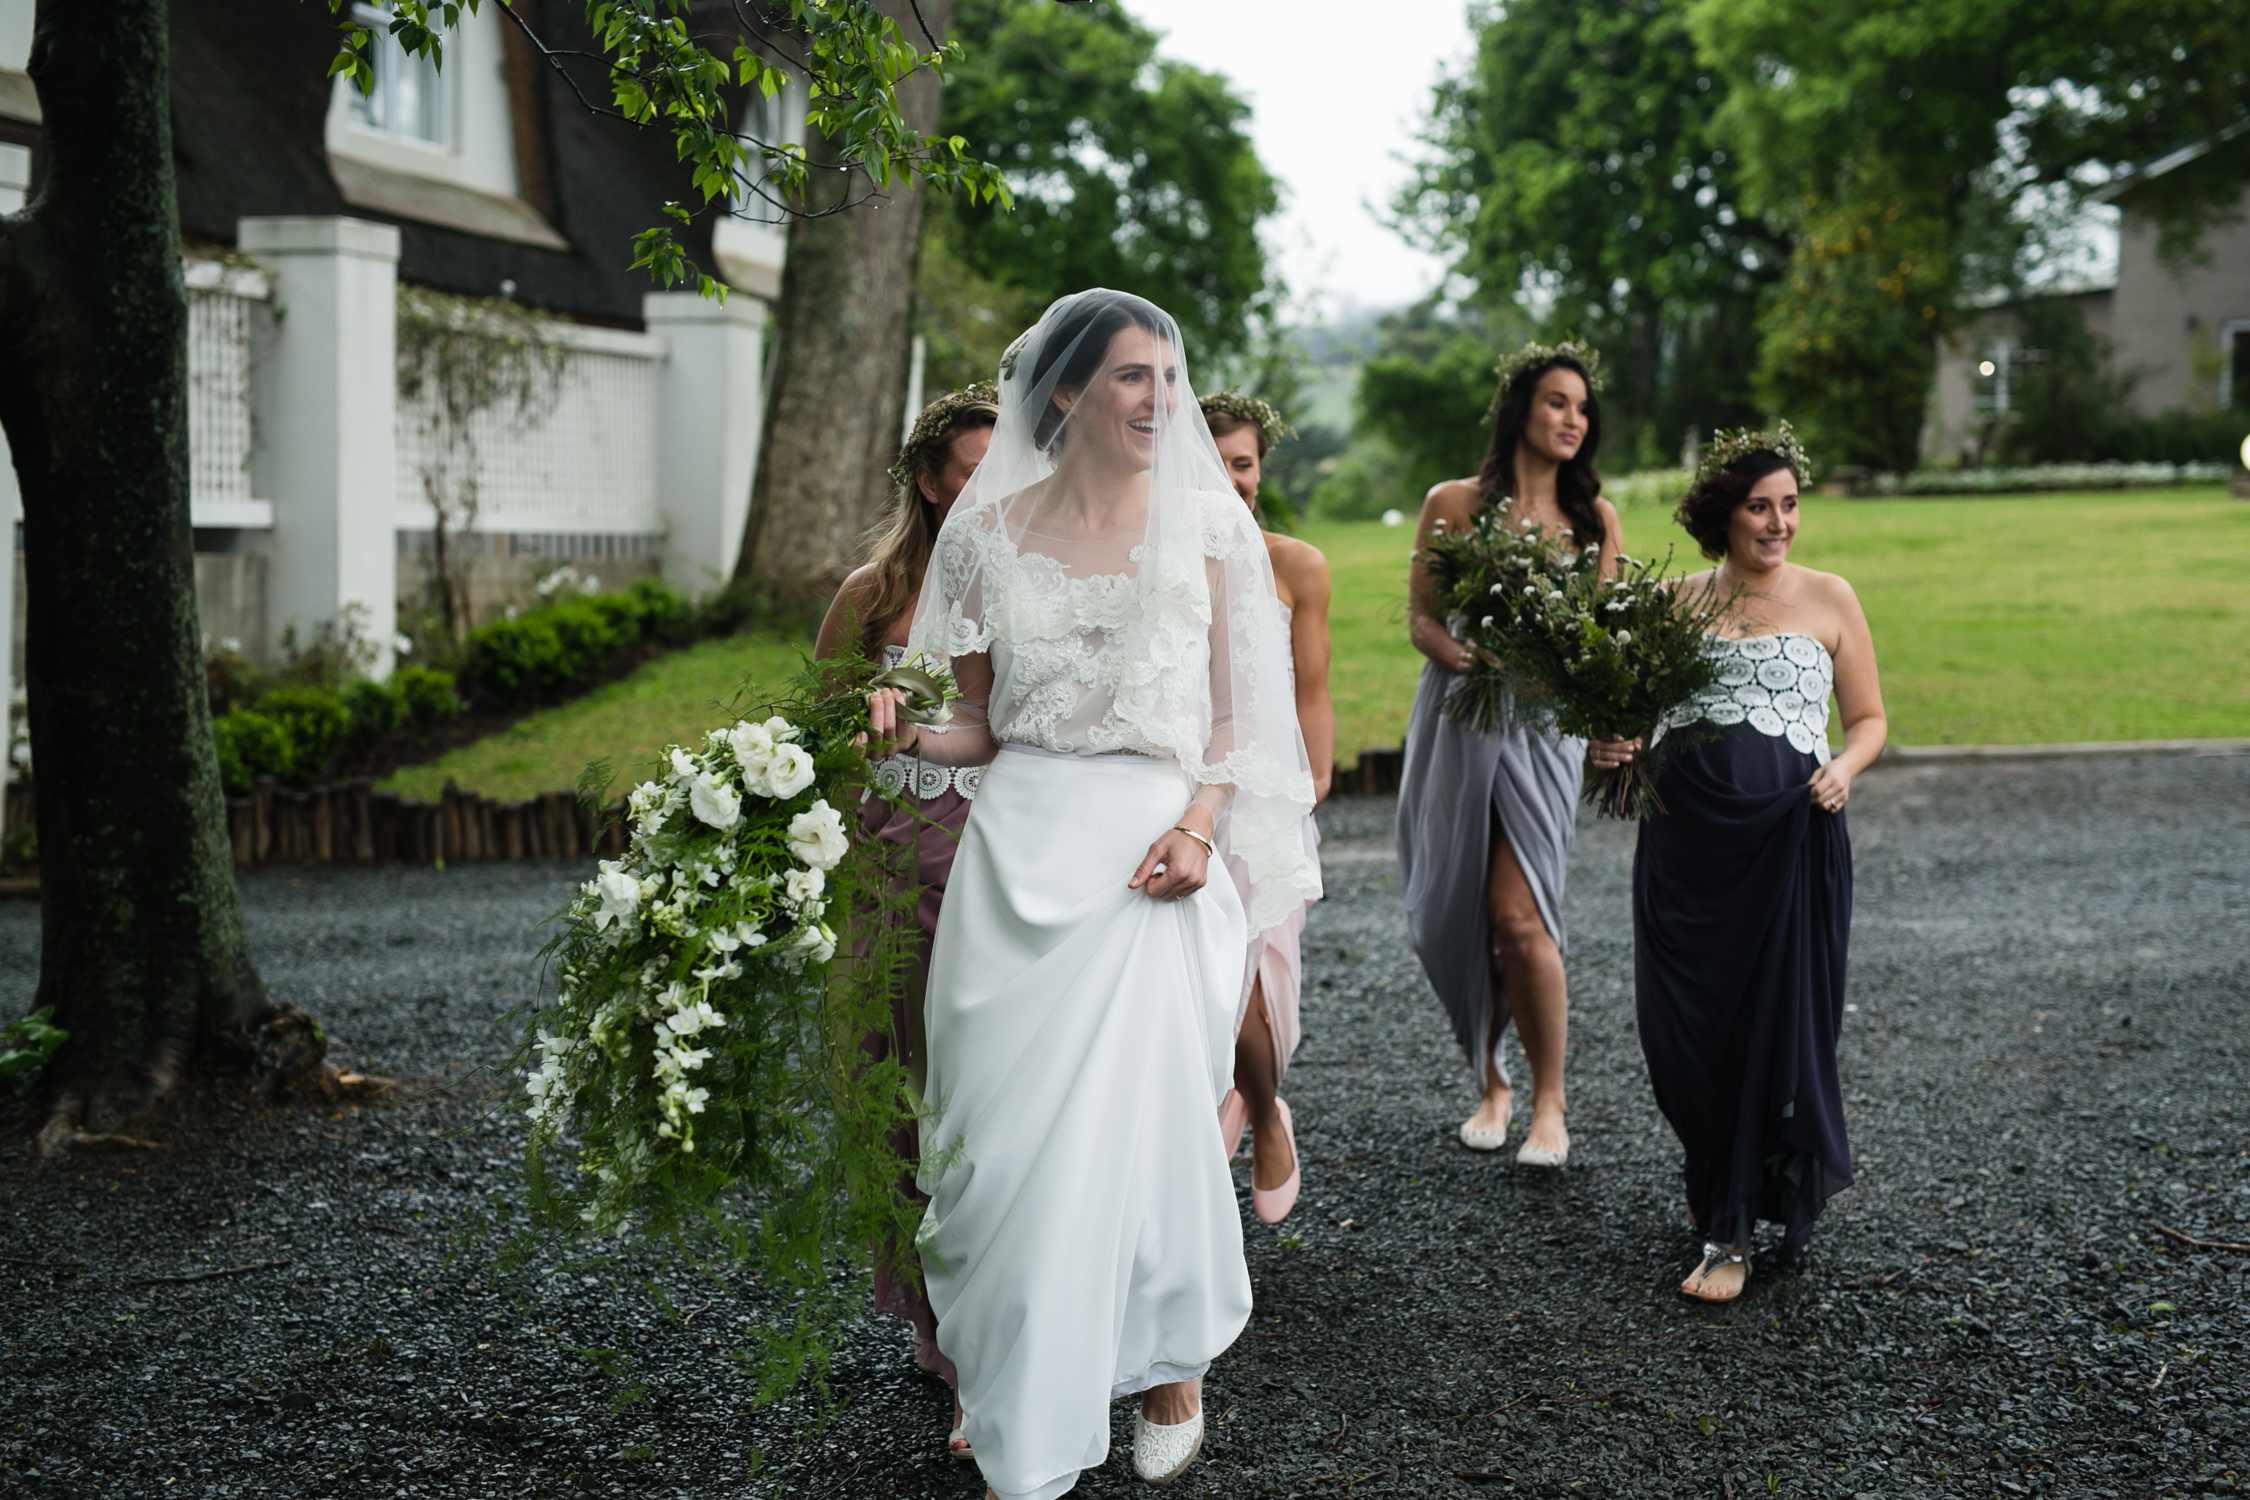 heisvisual-wedding-photographers-documentary-midlands-south-africa035.jpg